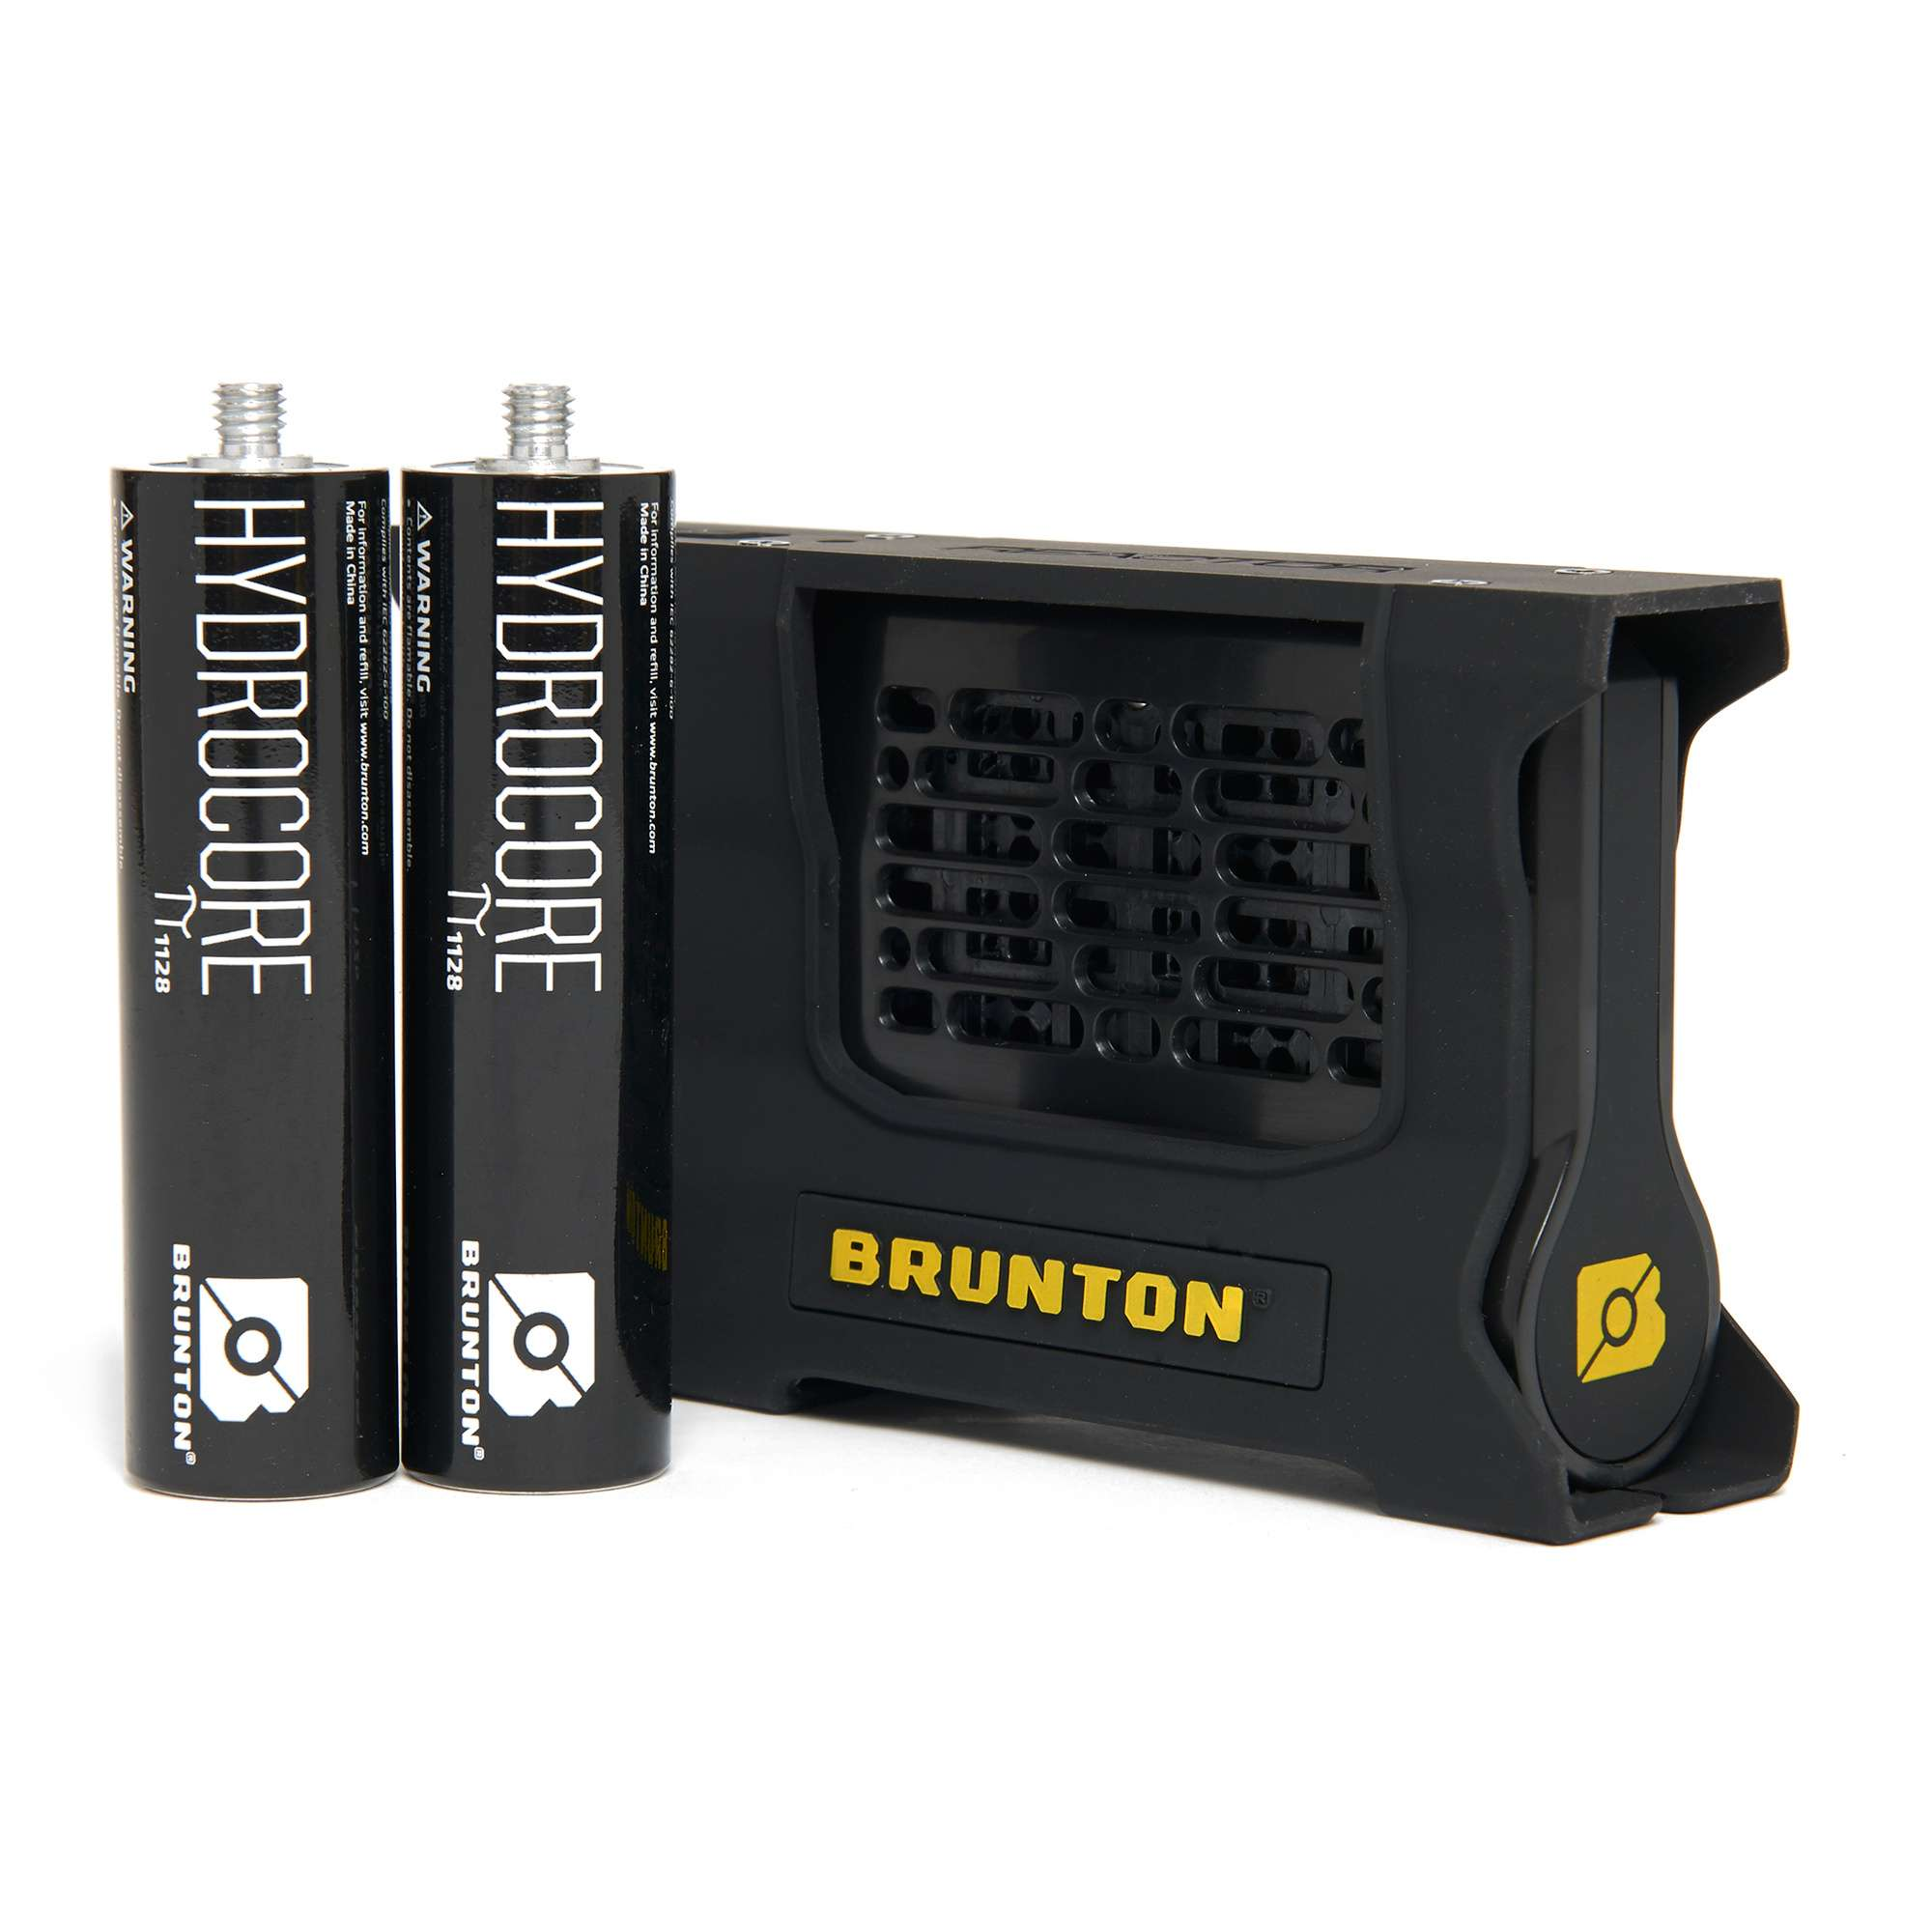 BRUNTON Hydrogen Reactor™ Portable Charger